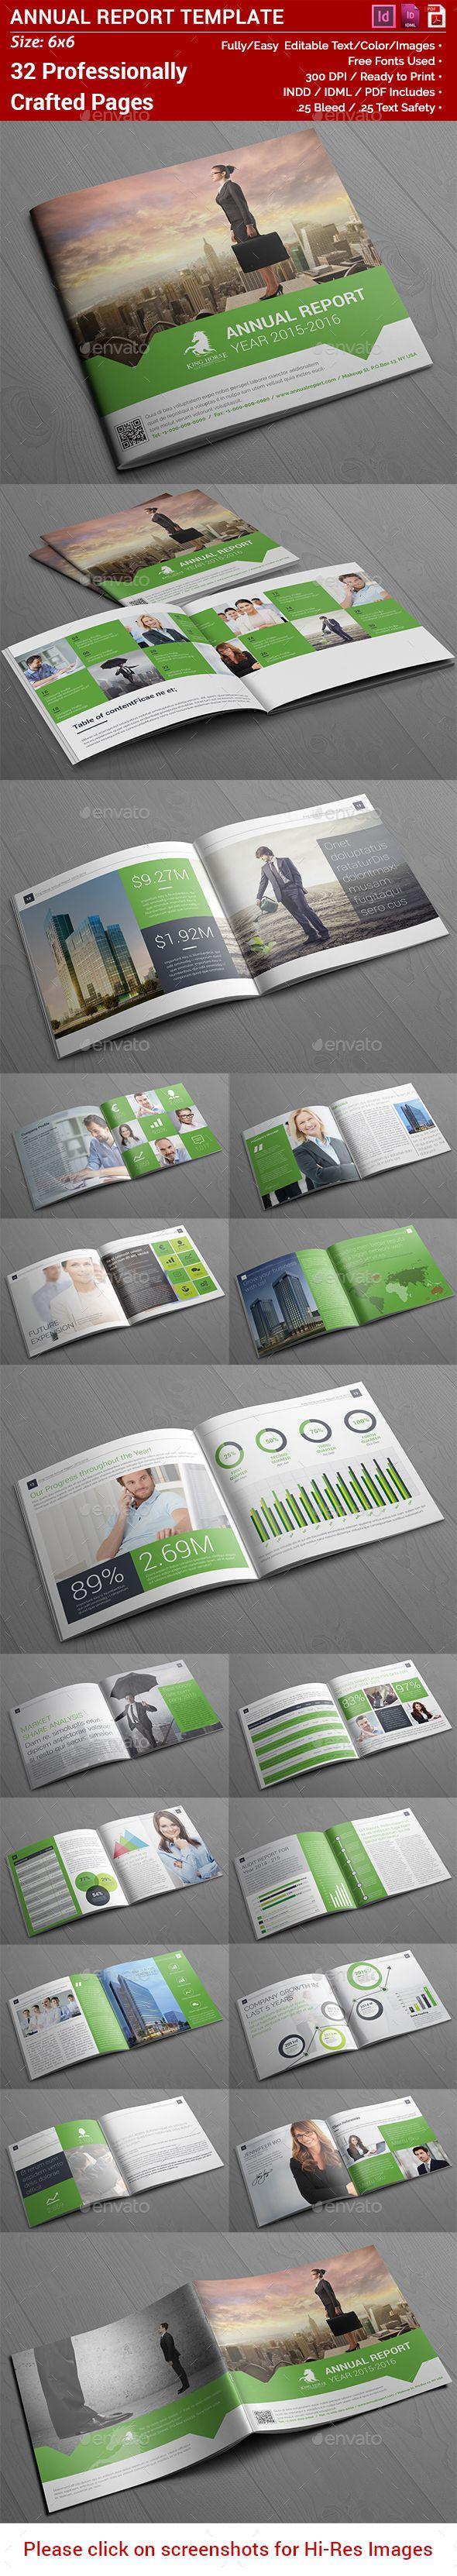 Square Annual Report Template InDesign INDD #design Download: http://graphicriver.net/item/square-annual-report/14312367?ref=ksioks